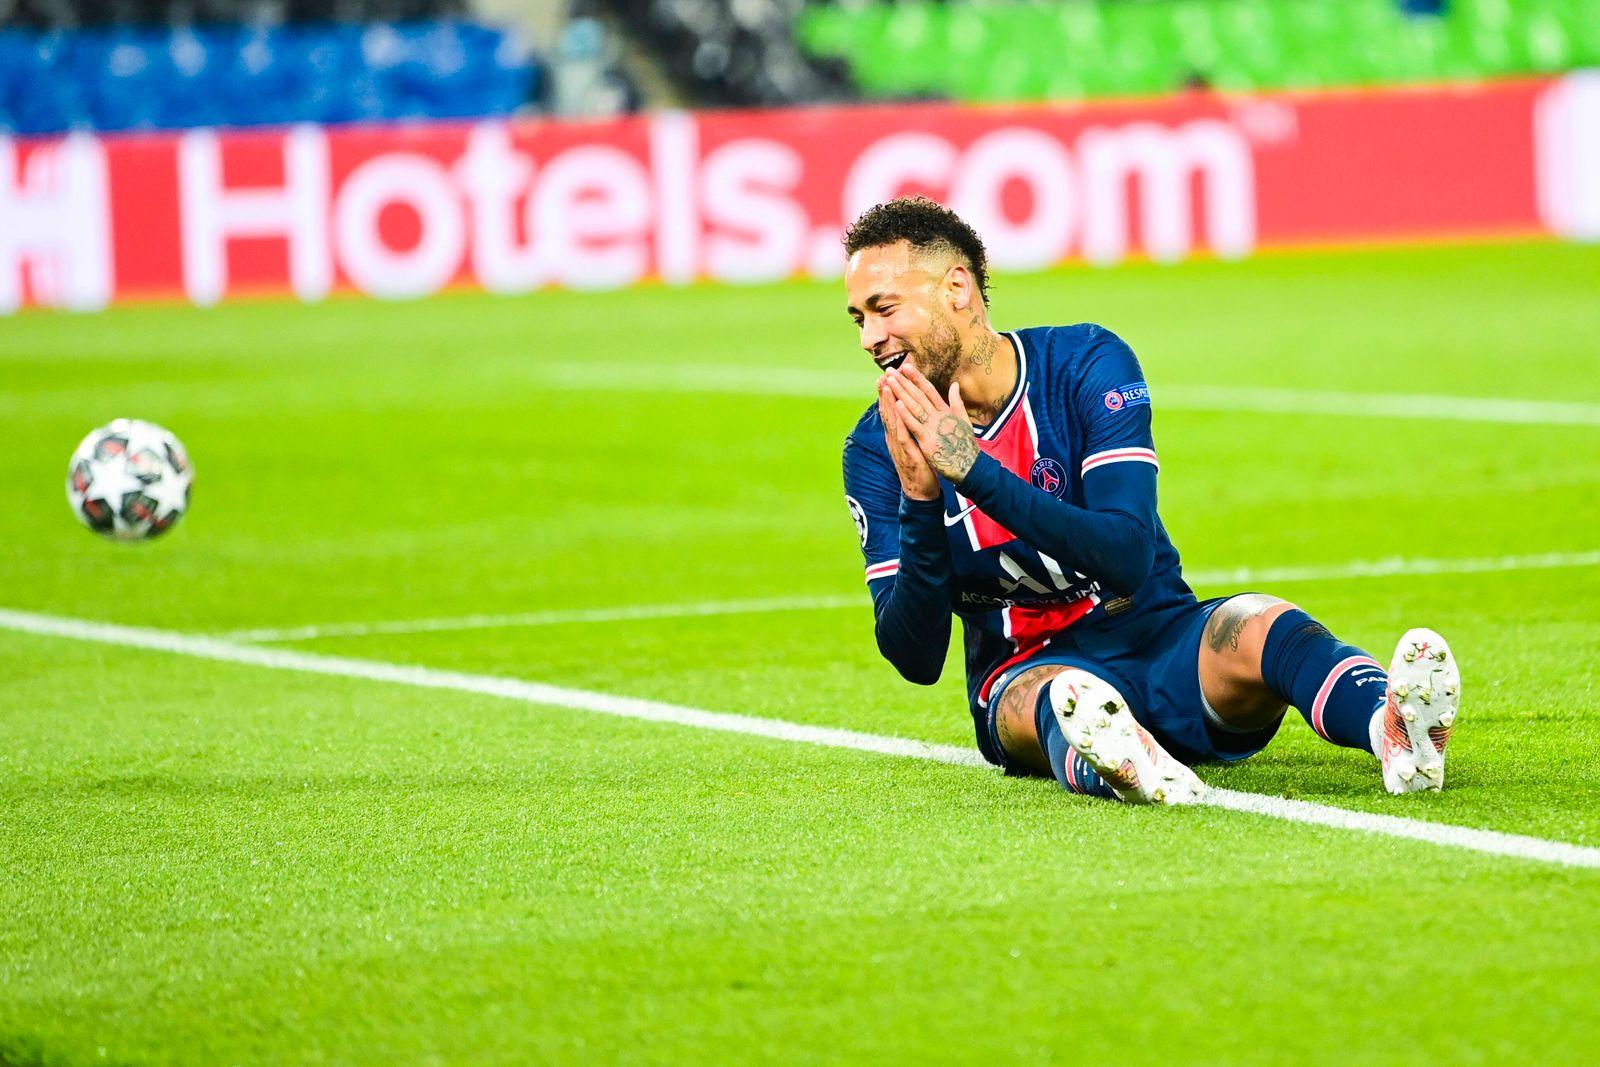 deception de Neymar Jr (PSG) FOOTBALL : PSG vs Bayern de Munich - 1/4 finale - ligue des Champions - 13/04/2021 JBAutiss